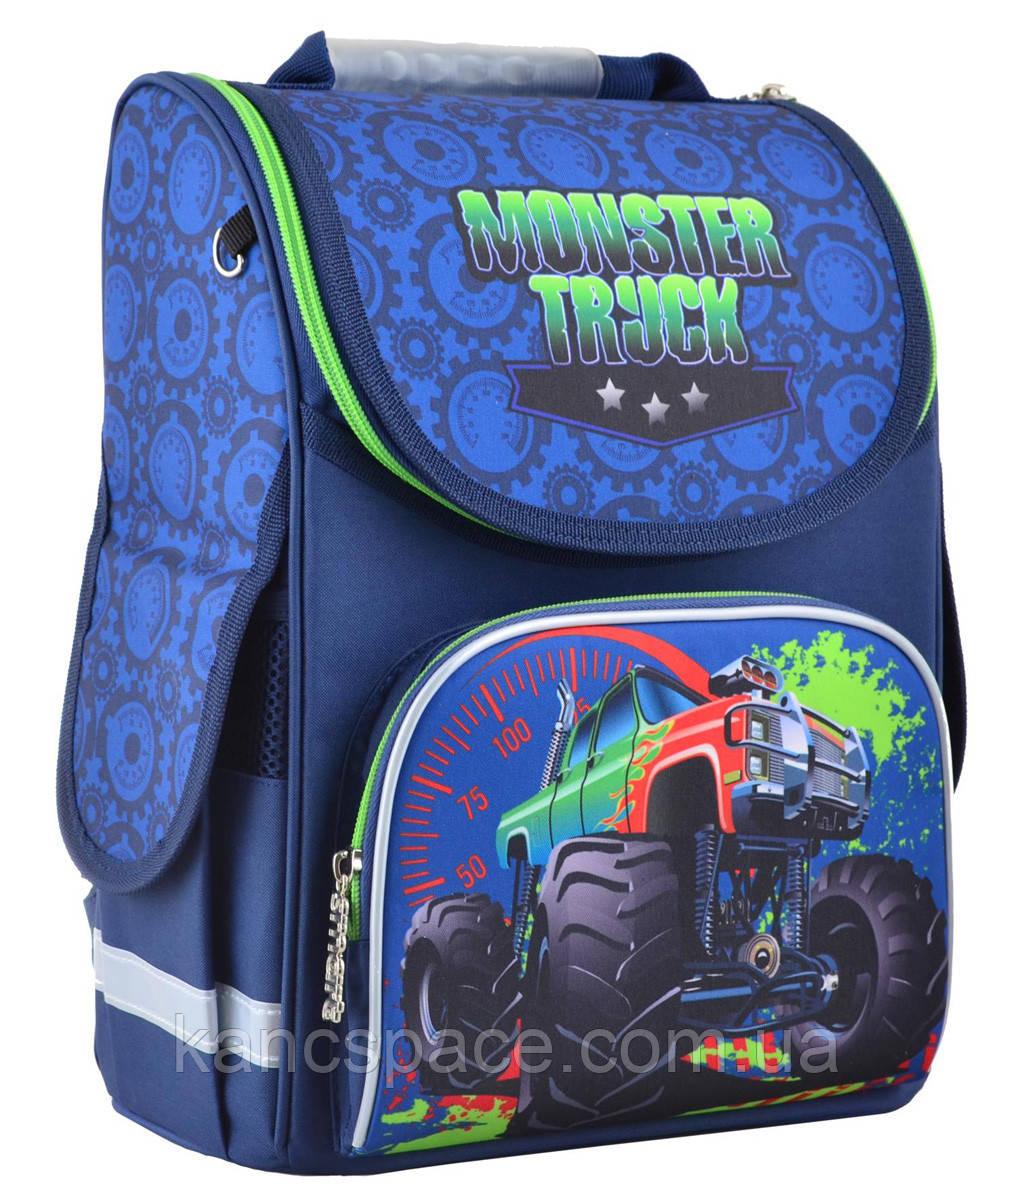 Рюкзак каркасний PG-11 Monster truck, 34*26*14